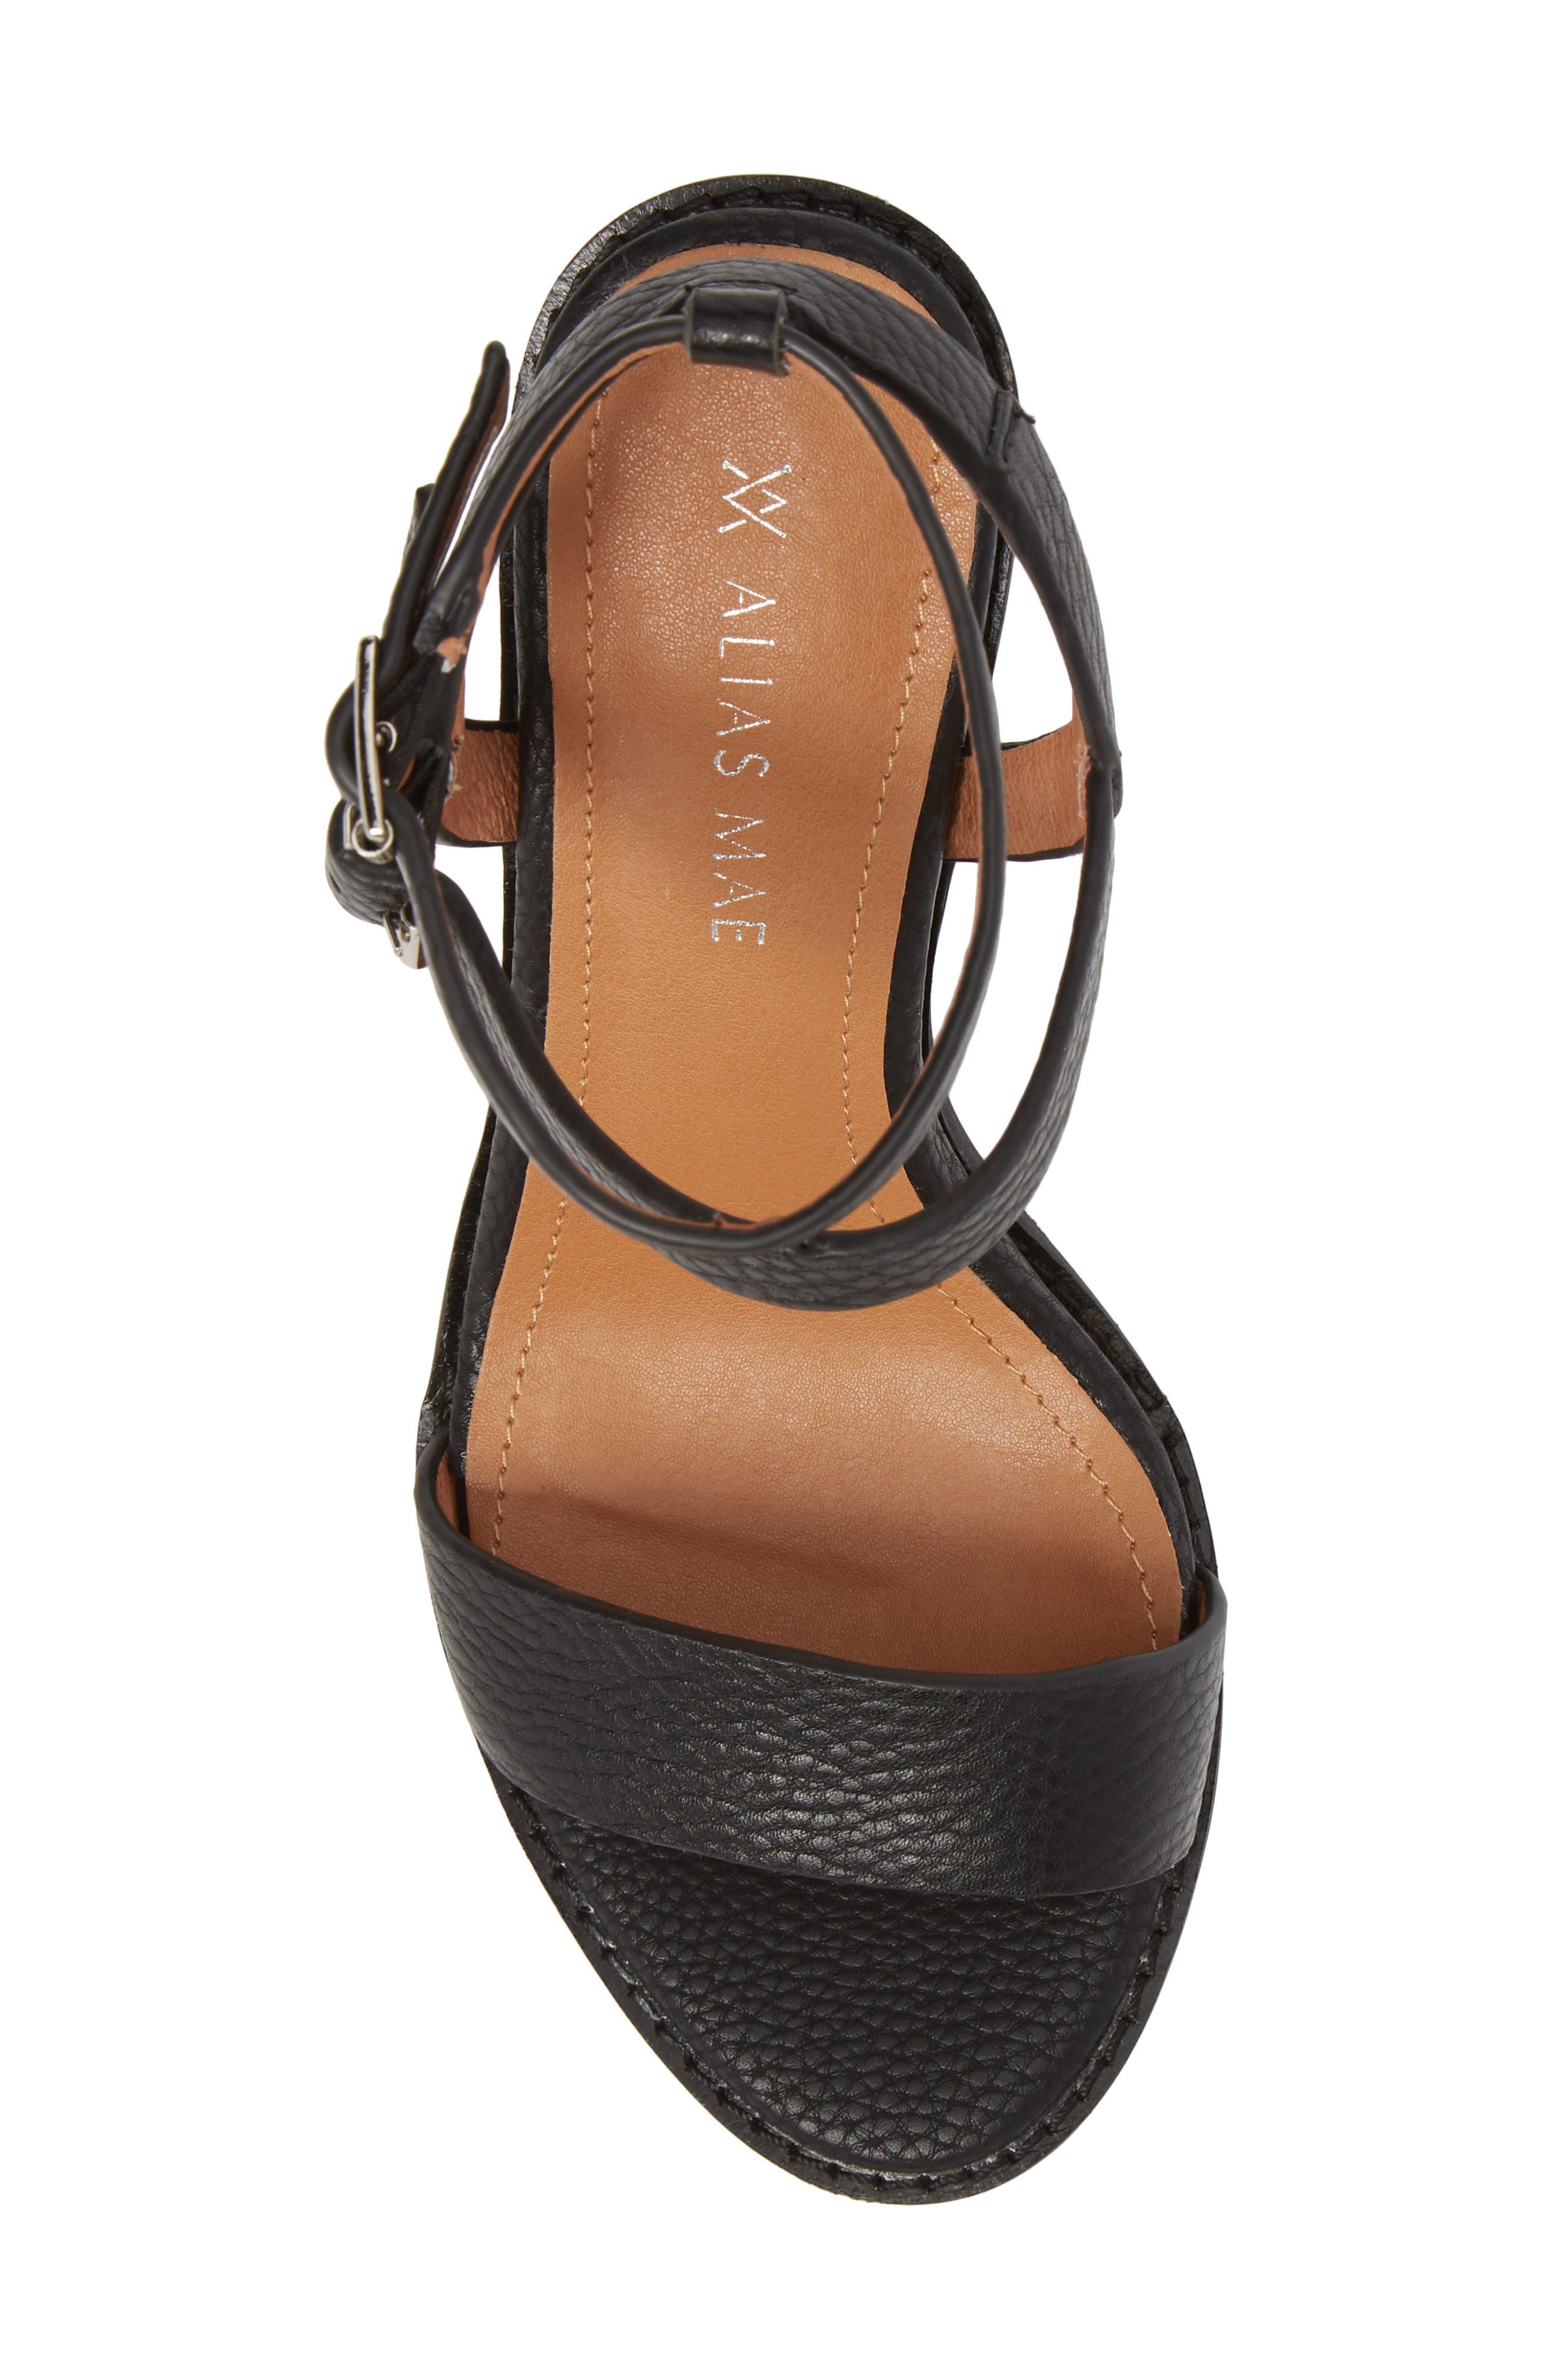 Elapse Sandal,                             Alternate thumbnail 5, color,                             Black Leather